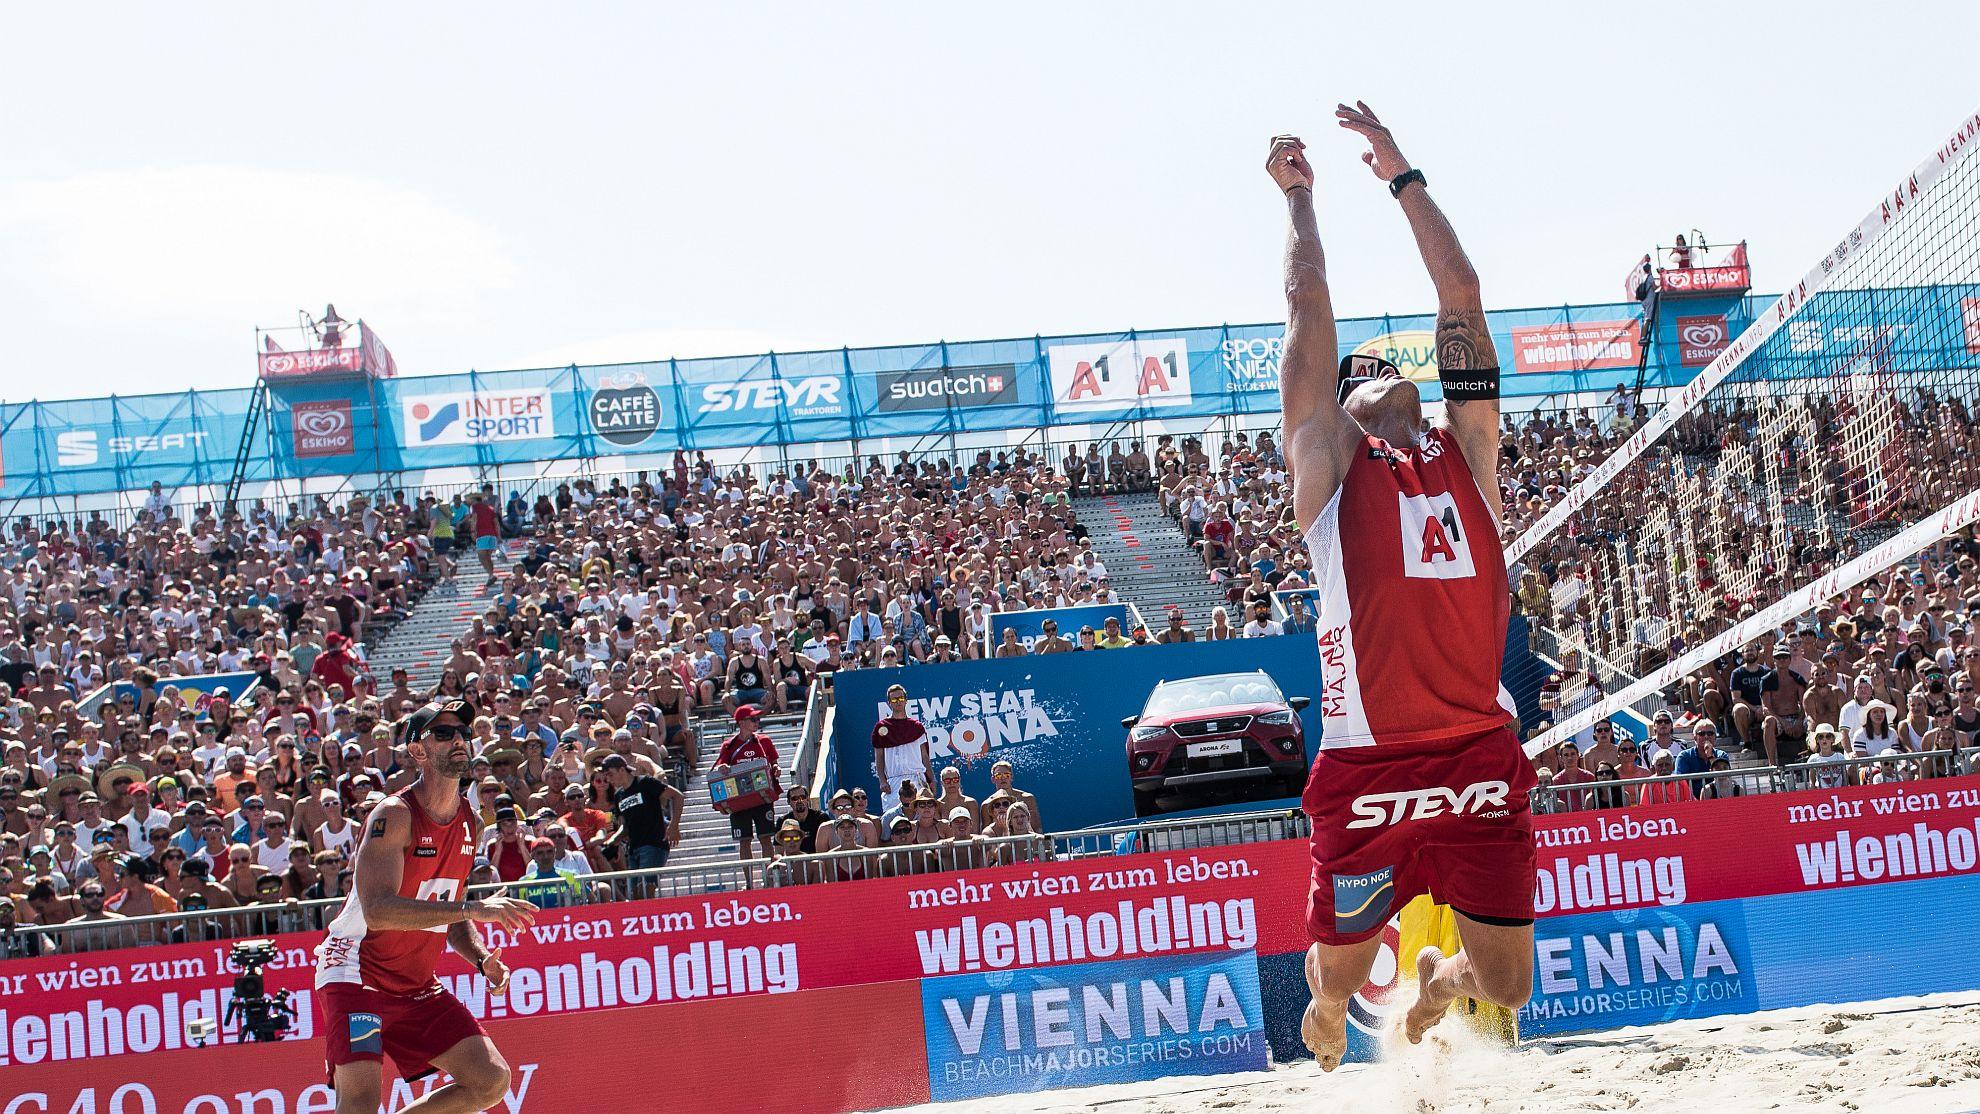 Clemens Doppler/Alex Horst 2018 - FOTO © Jörg Mitter/Beach Volleyball Major Series/Red Bull Content Pool